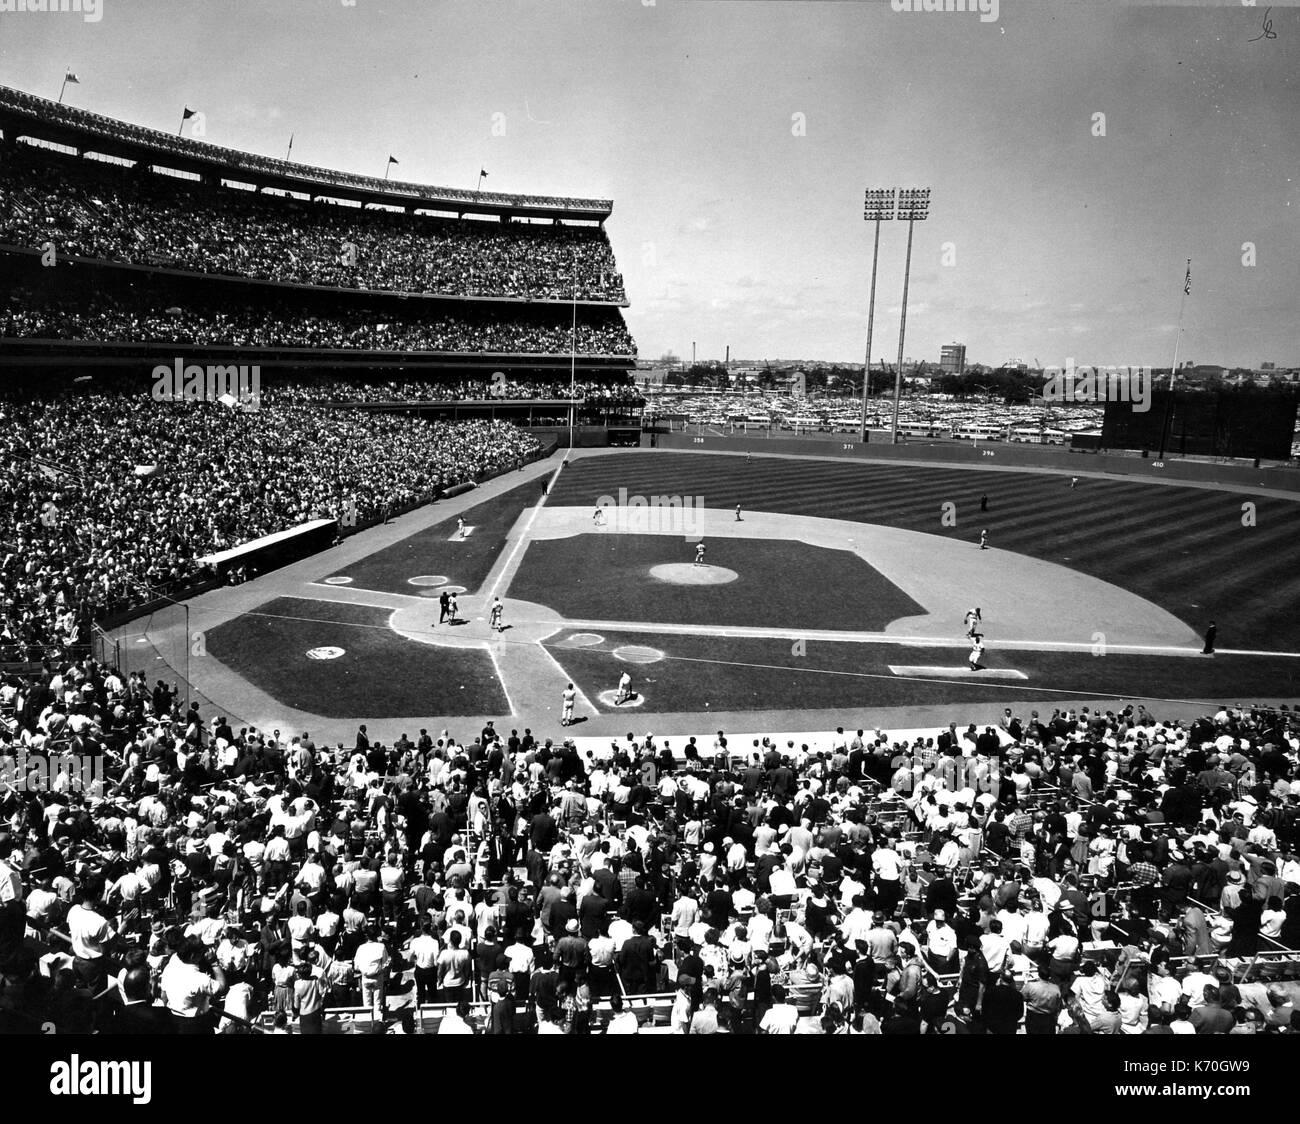 Madison Square Garden: Shea Stadium Black And White Stock Photos & Images